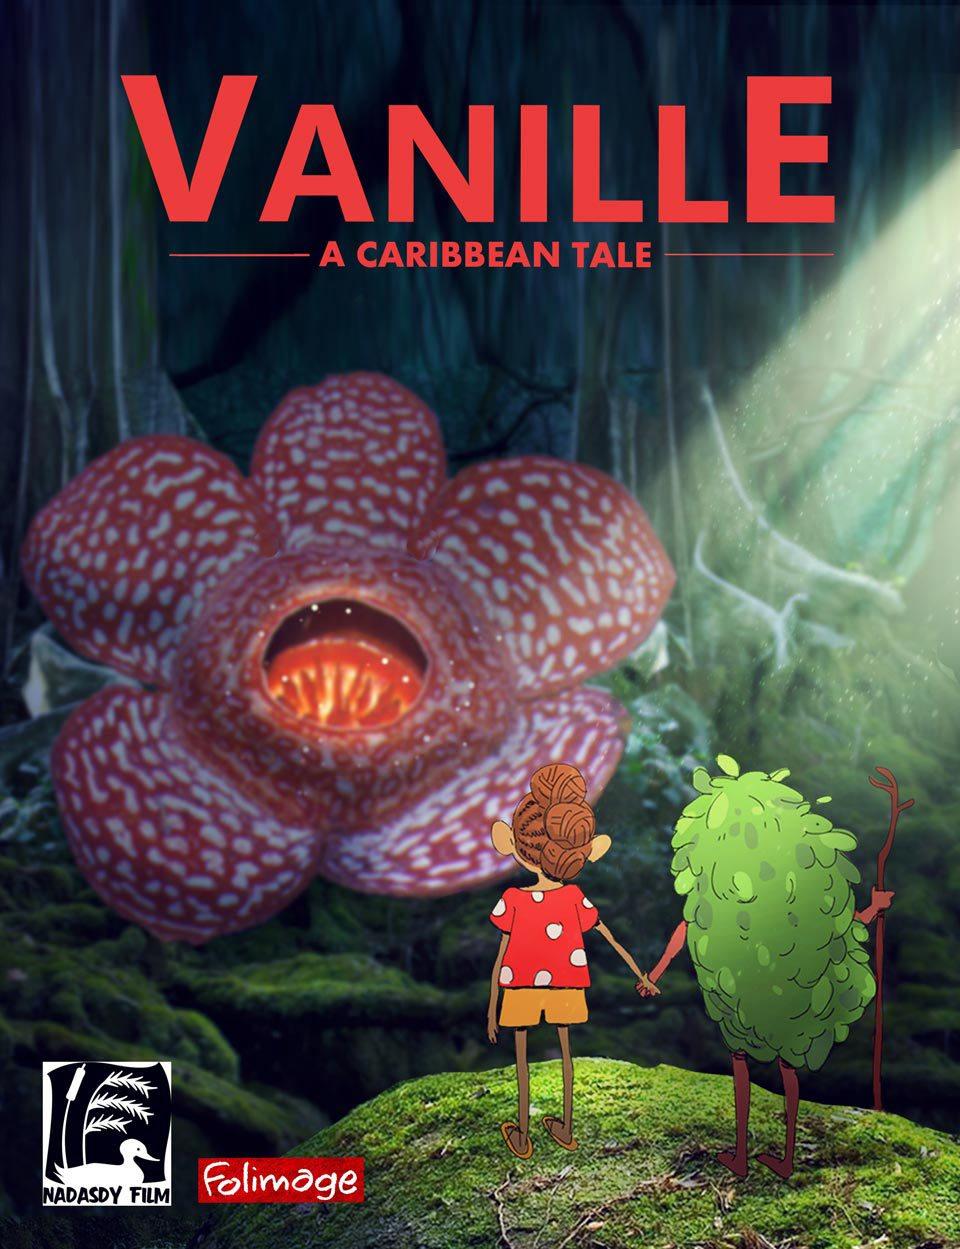 Vanille. © Folimage Studio/Nadasdy Film.